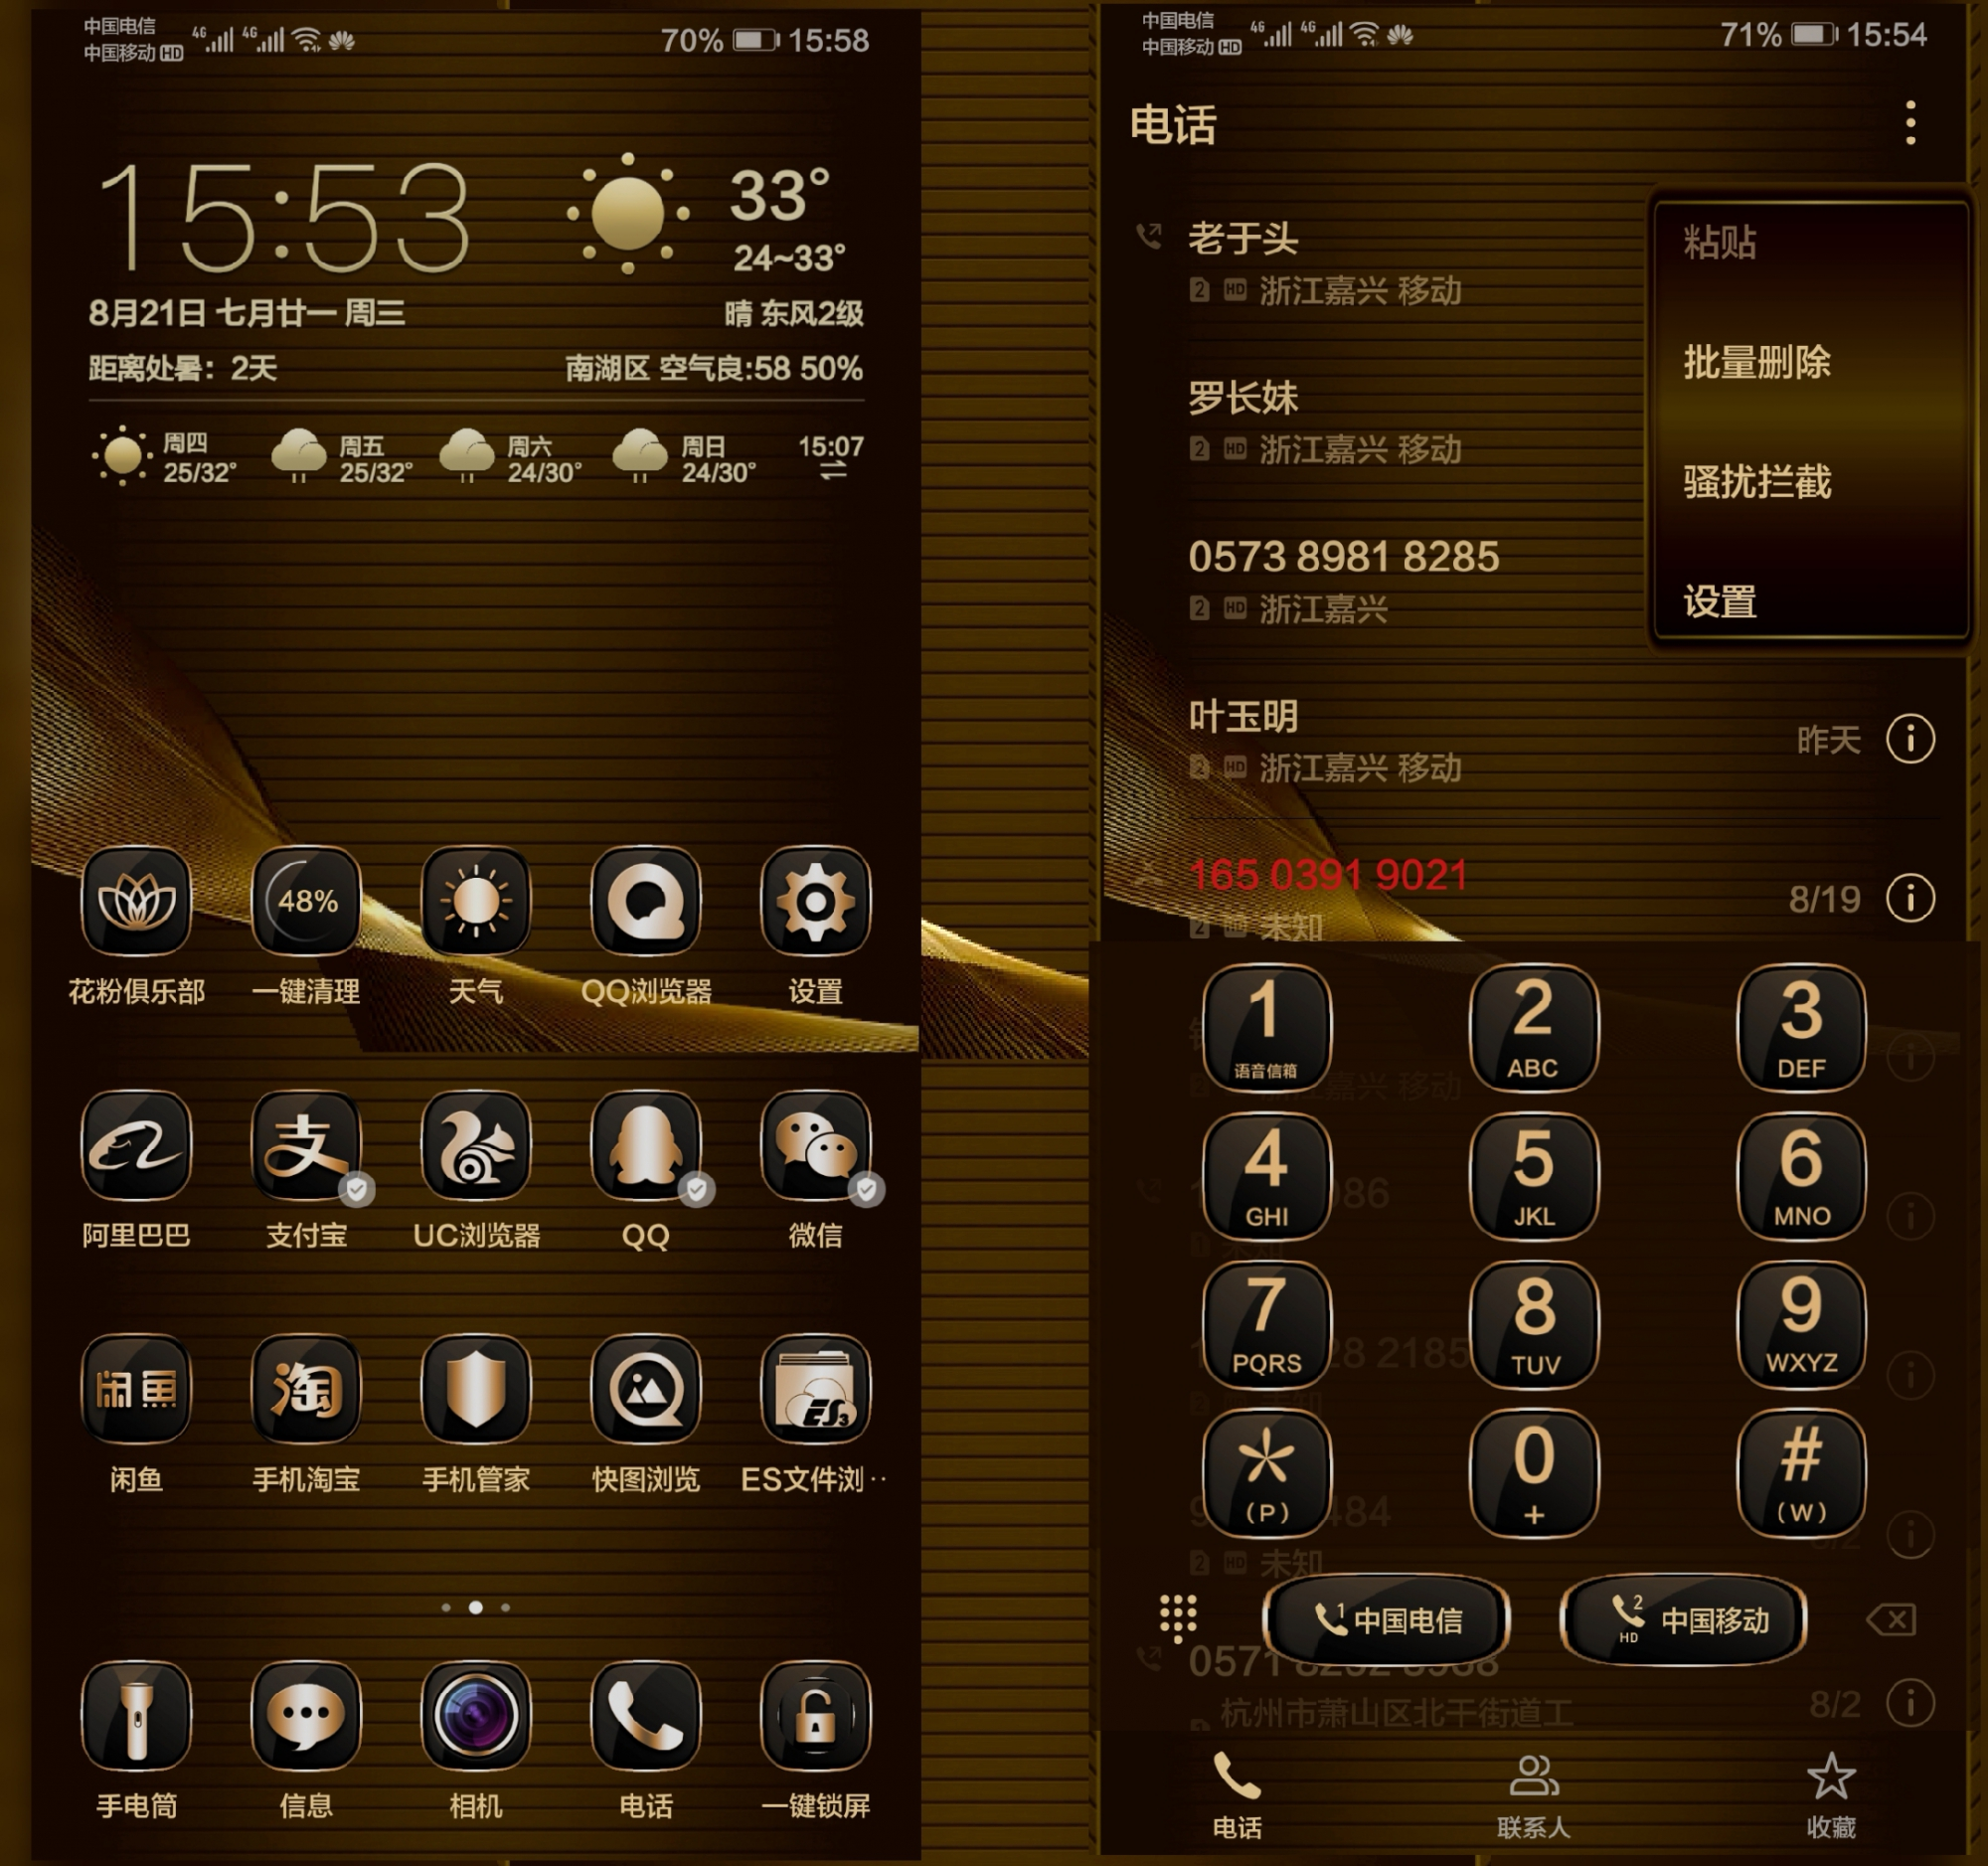 background_emui.9_1566364717566_1566377788746_1566377917672.jpg